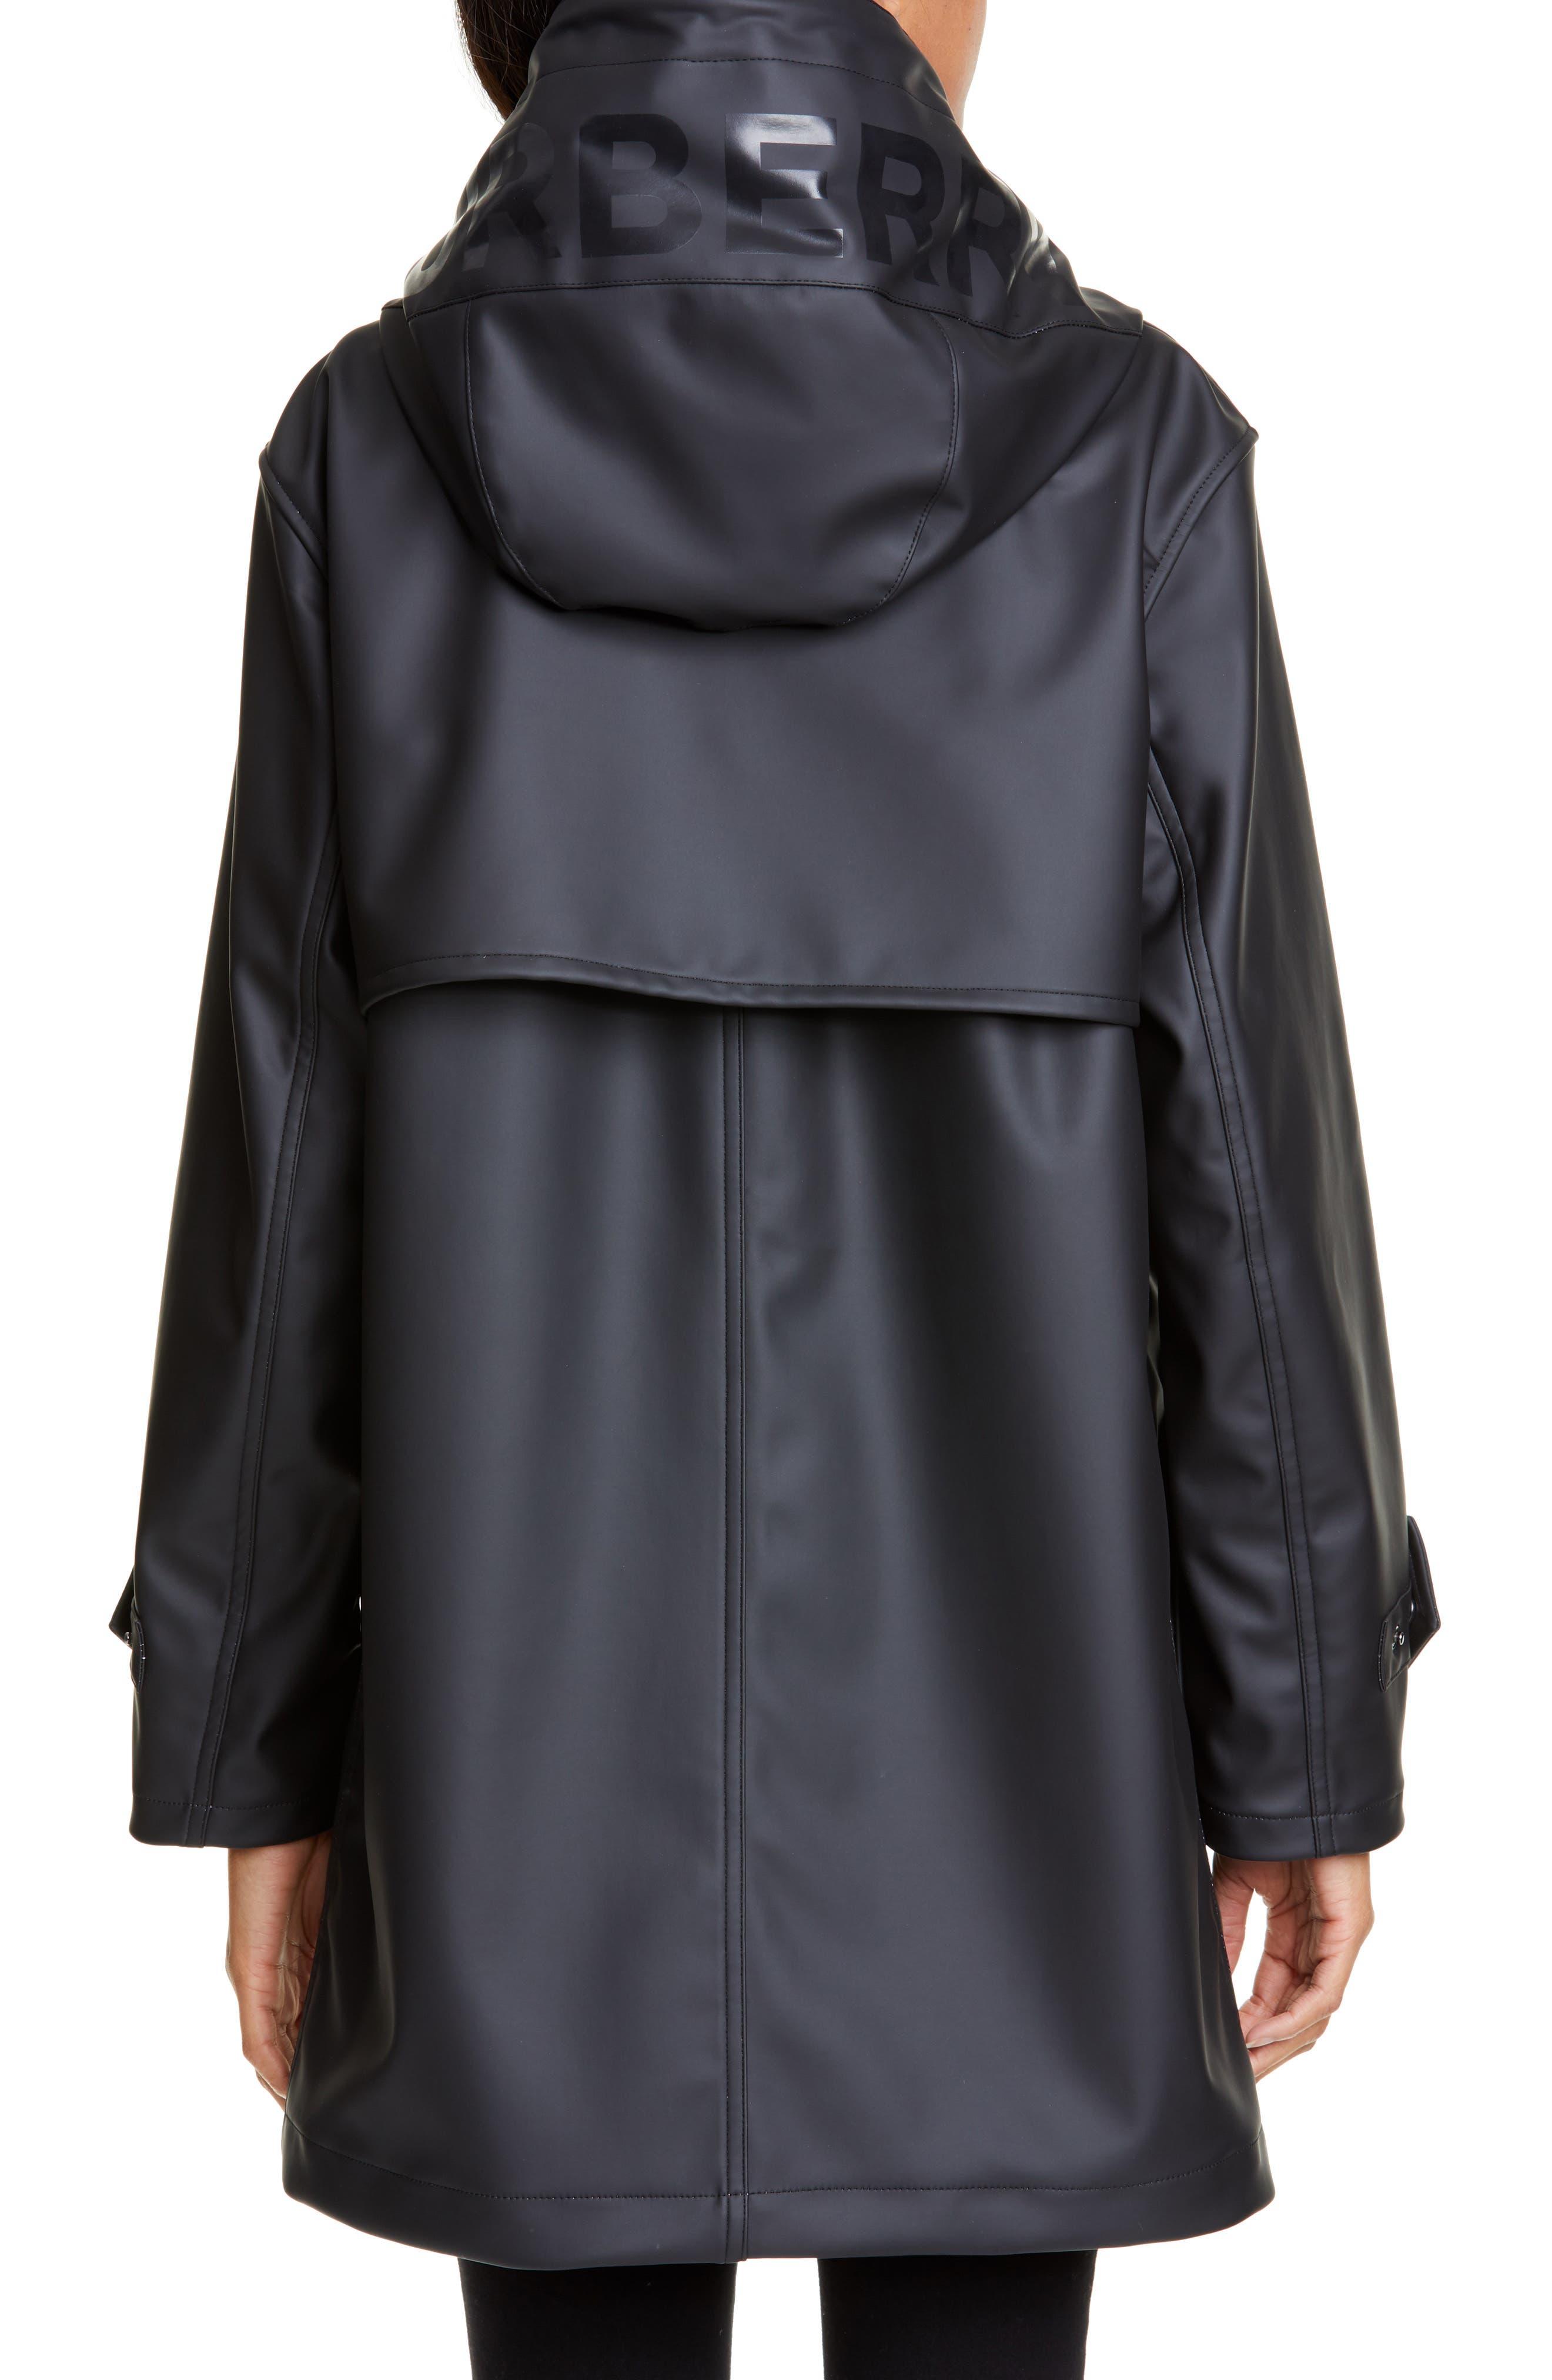 BURBERRY, Hartlebury Coated Rain Coat, Alternate thumbnail 2, color, BLACK / WHITE